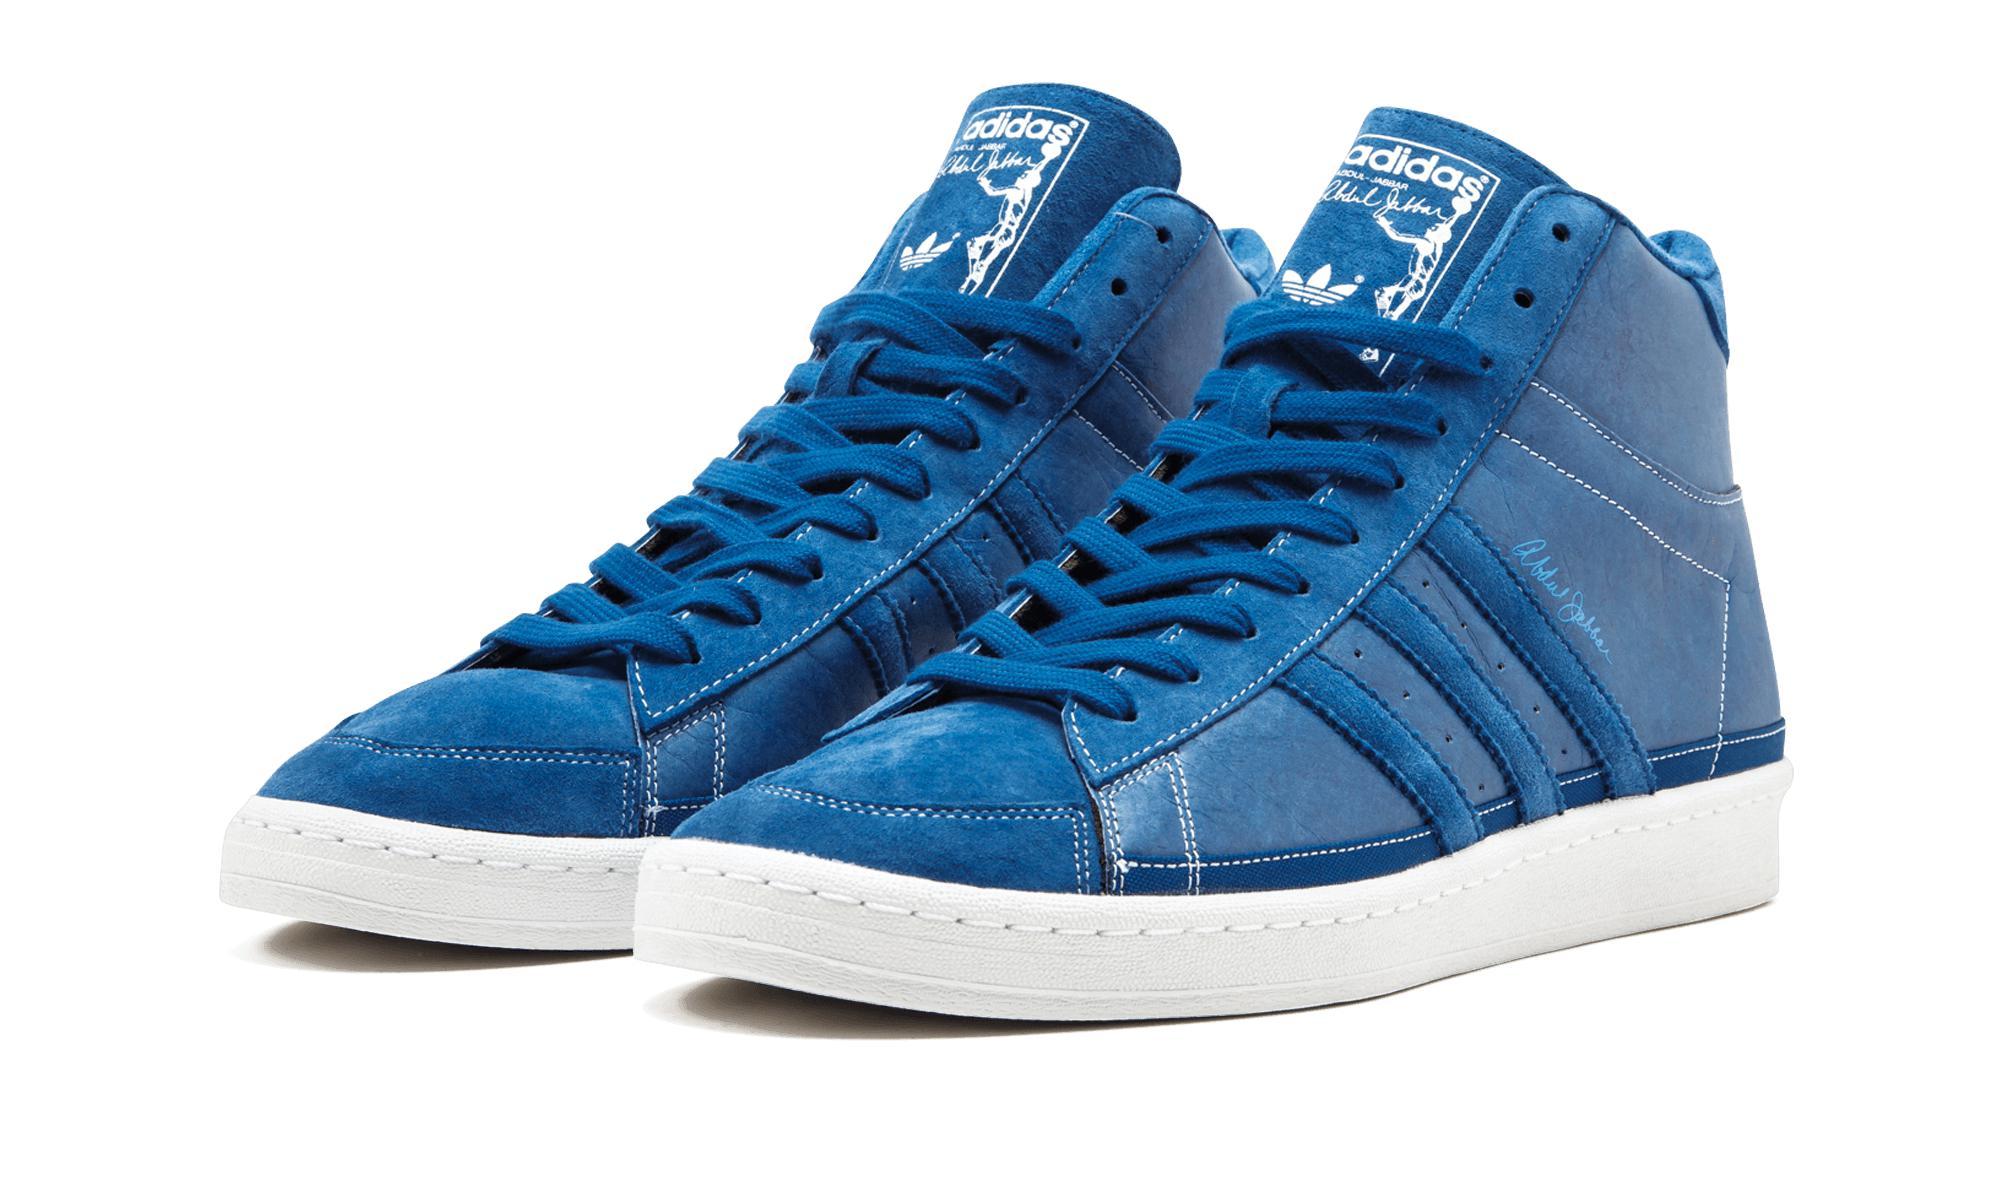 49d568a45 adidas Jabbar Hi in Blue for Men - Save 5% - Lyst